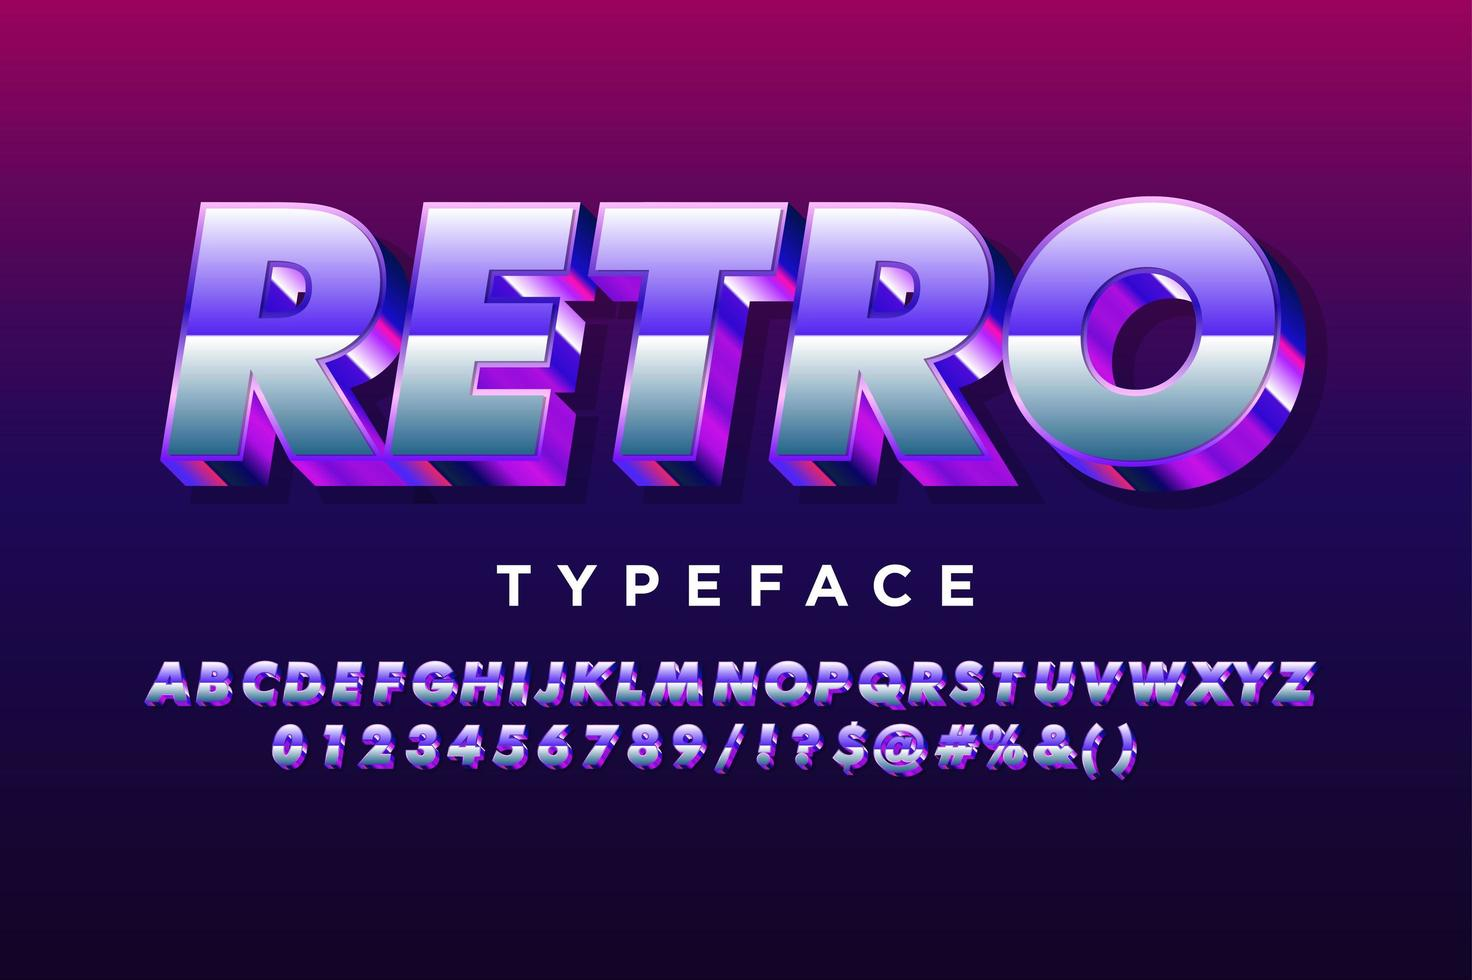 alfabeto retro metálico roxo vetor